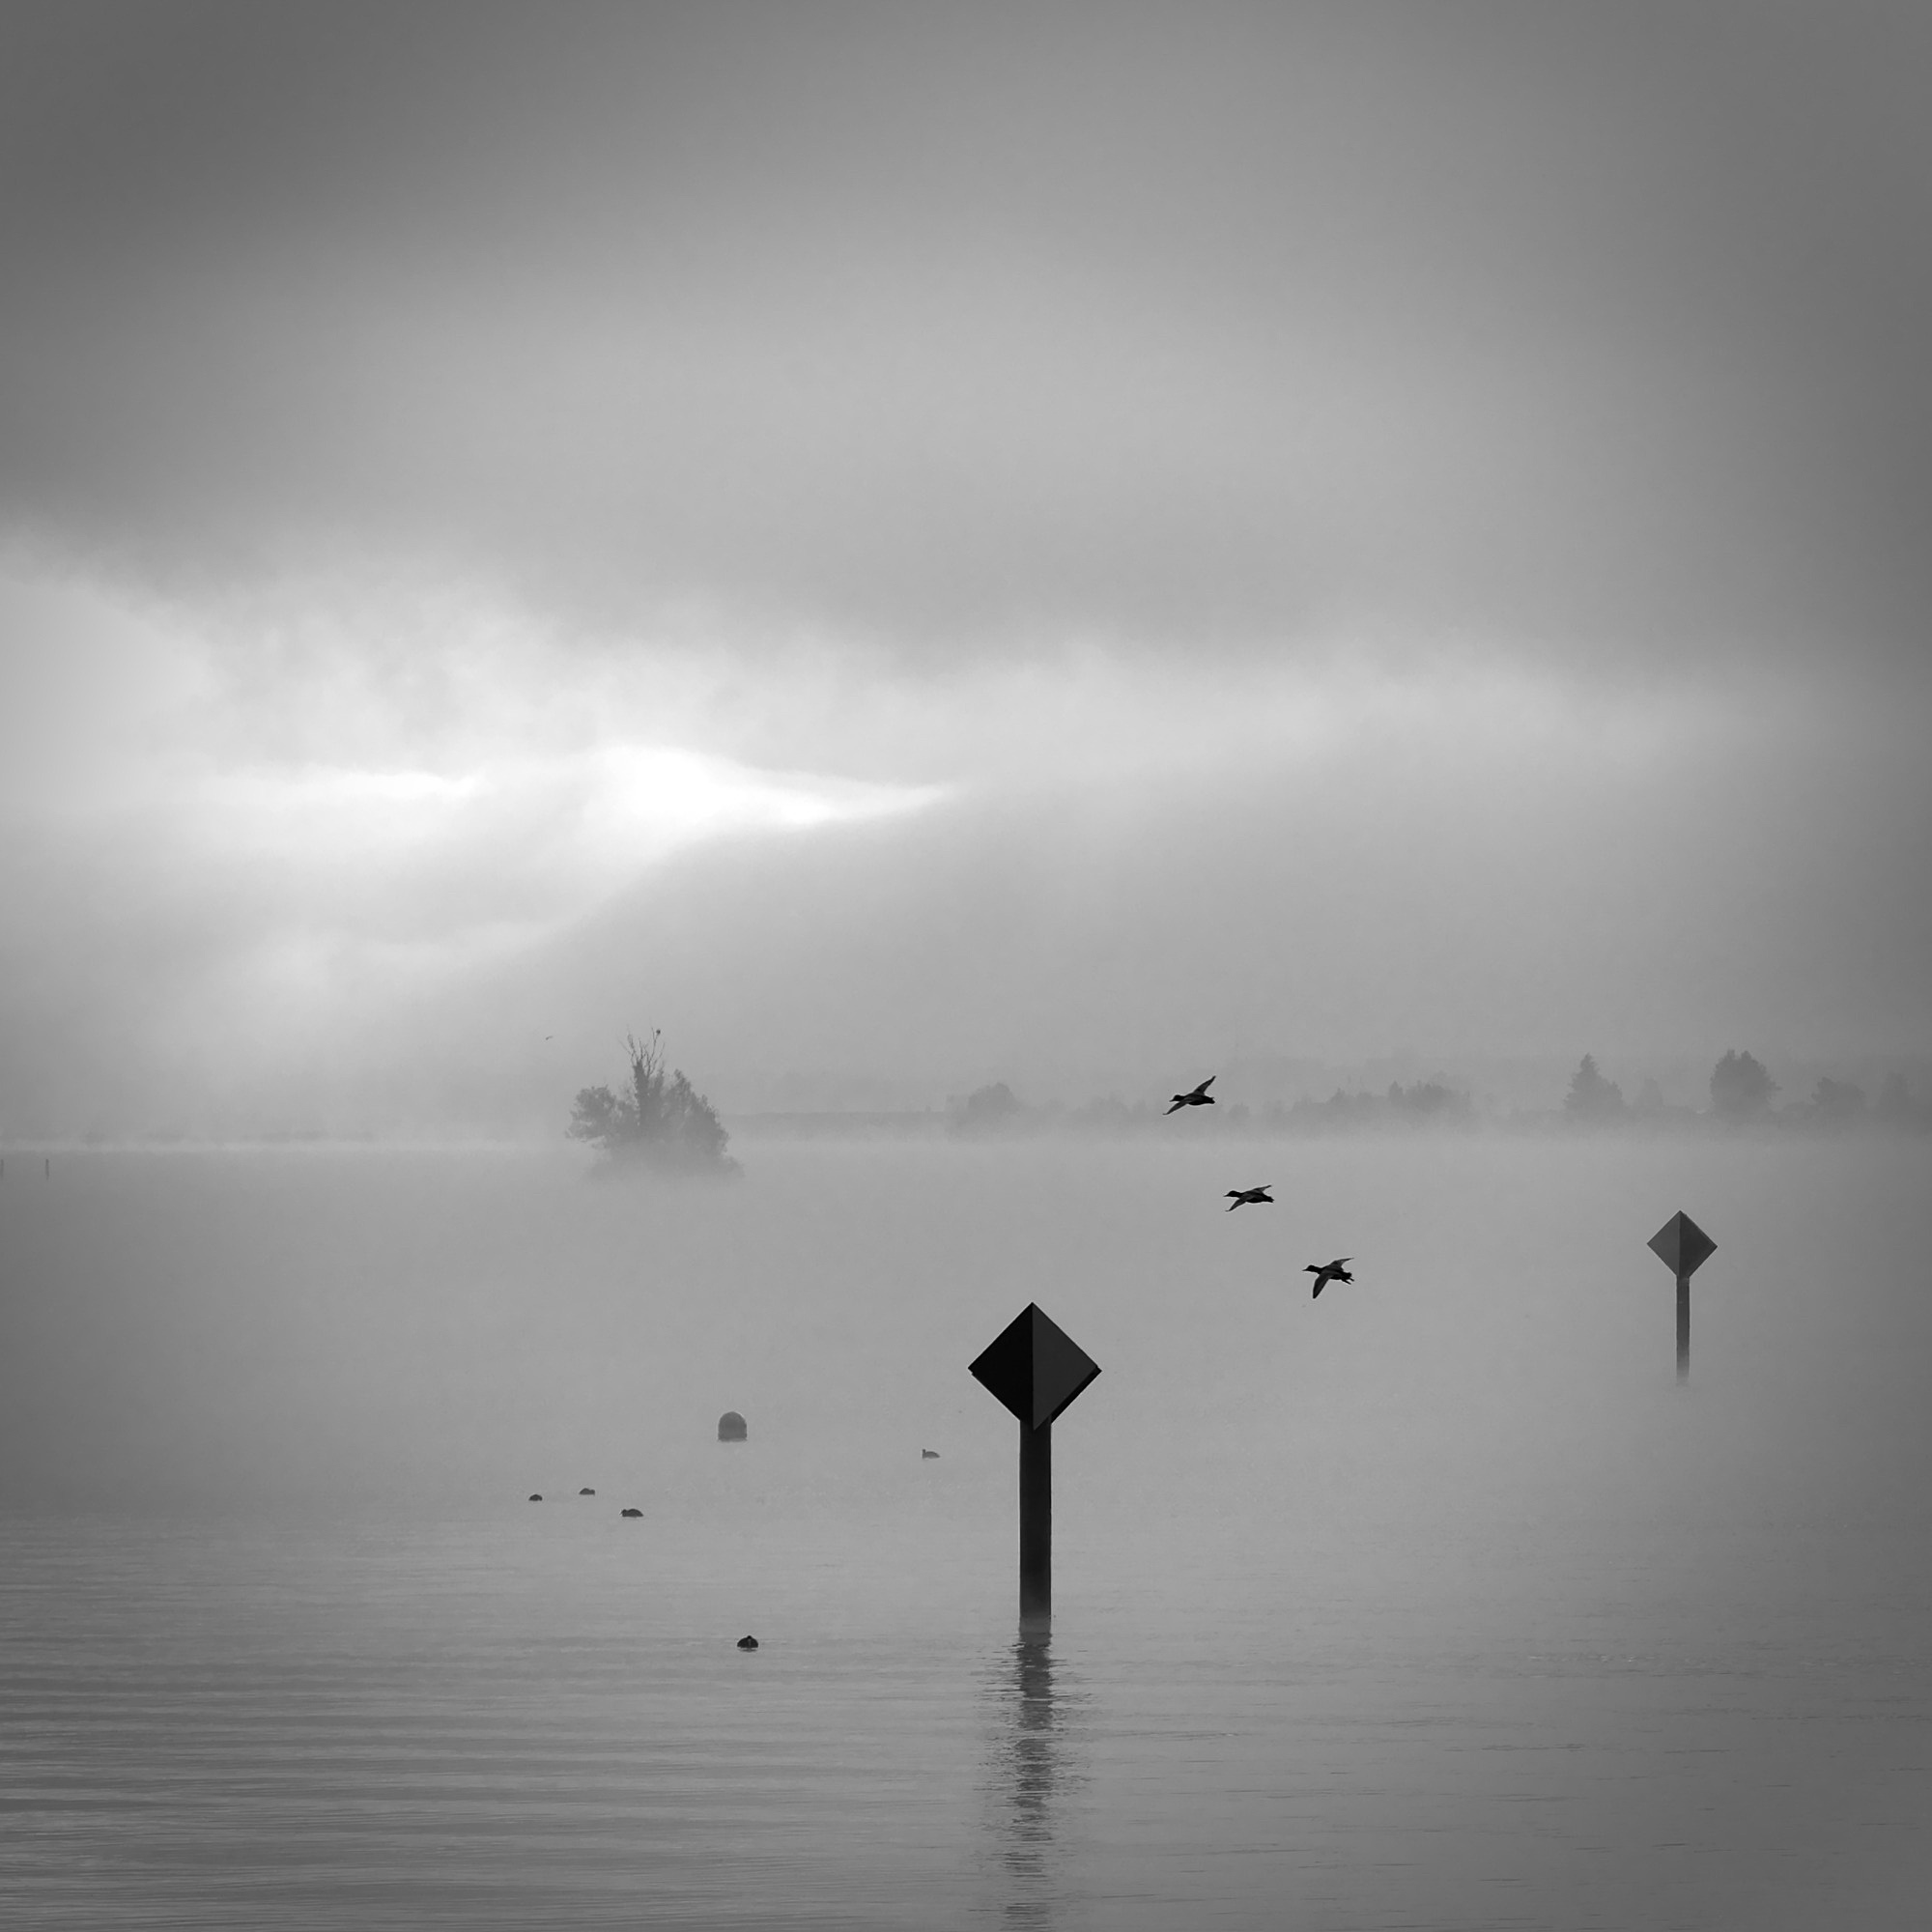 ylz / ducks in mist